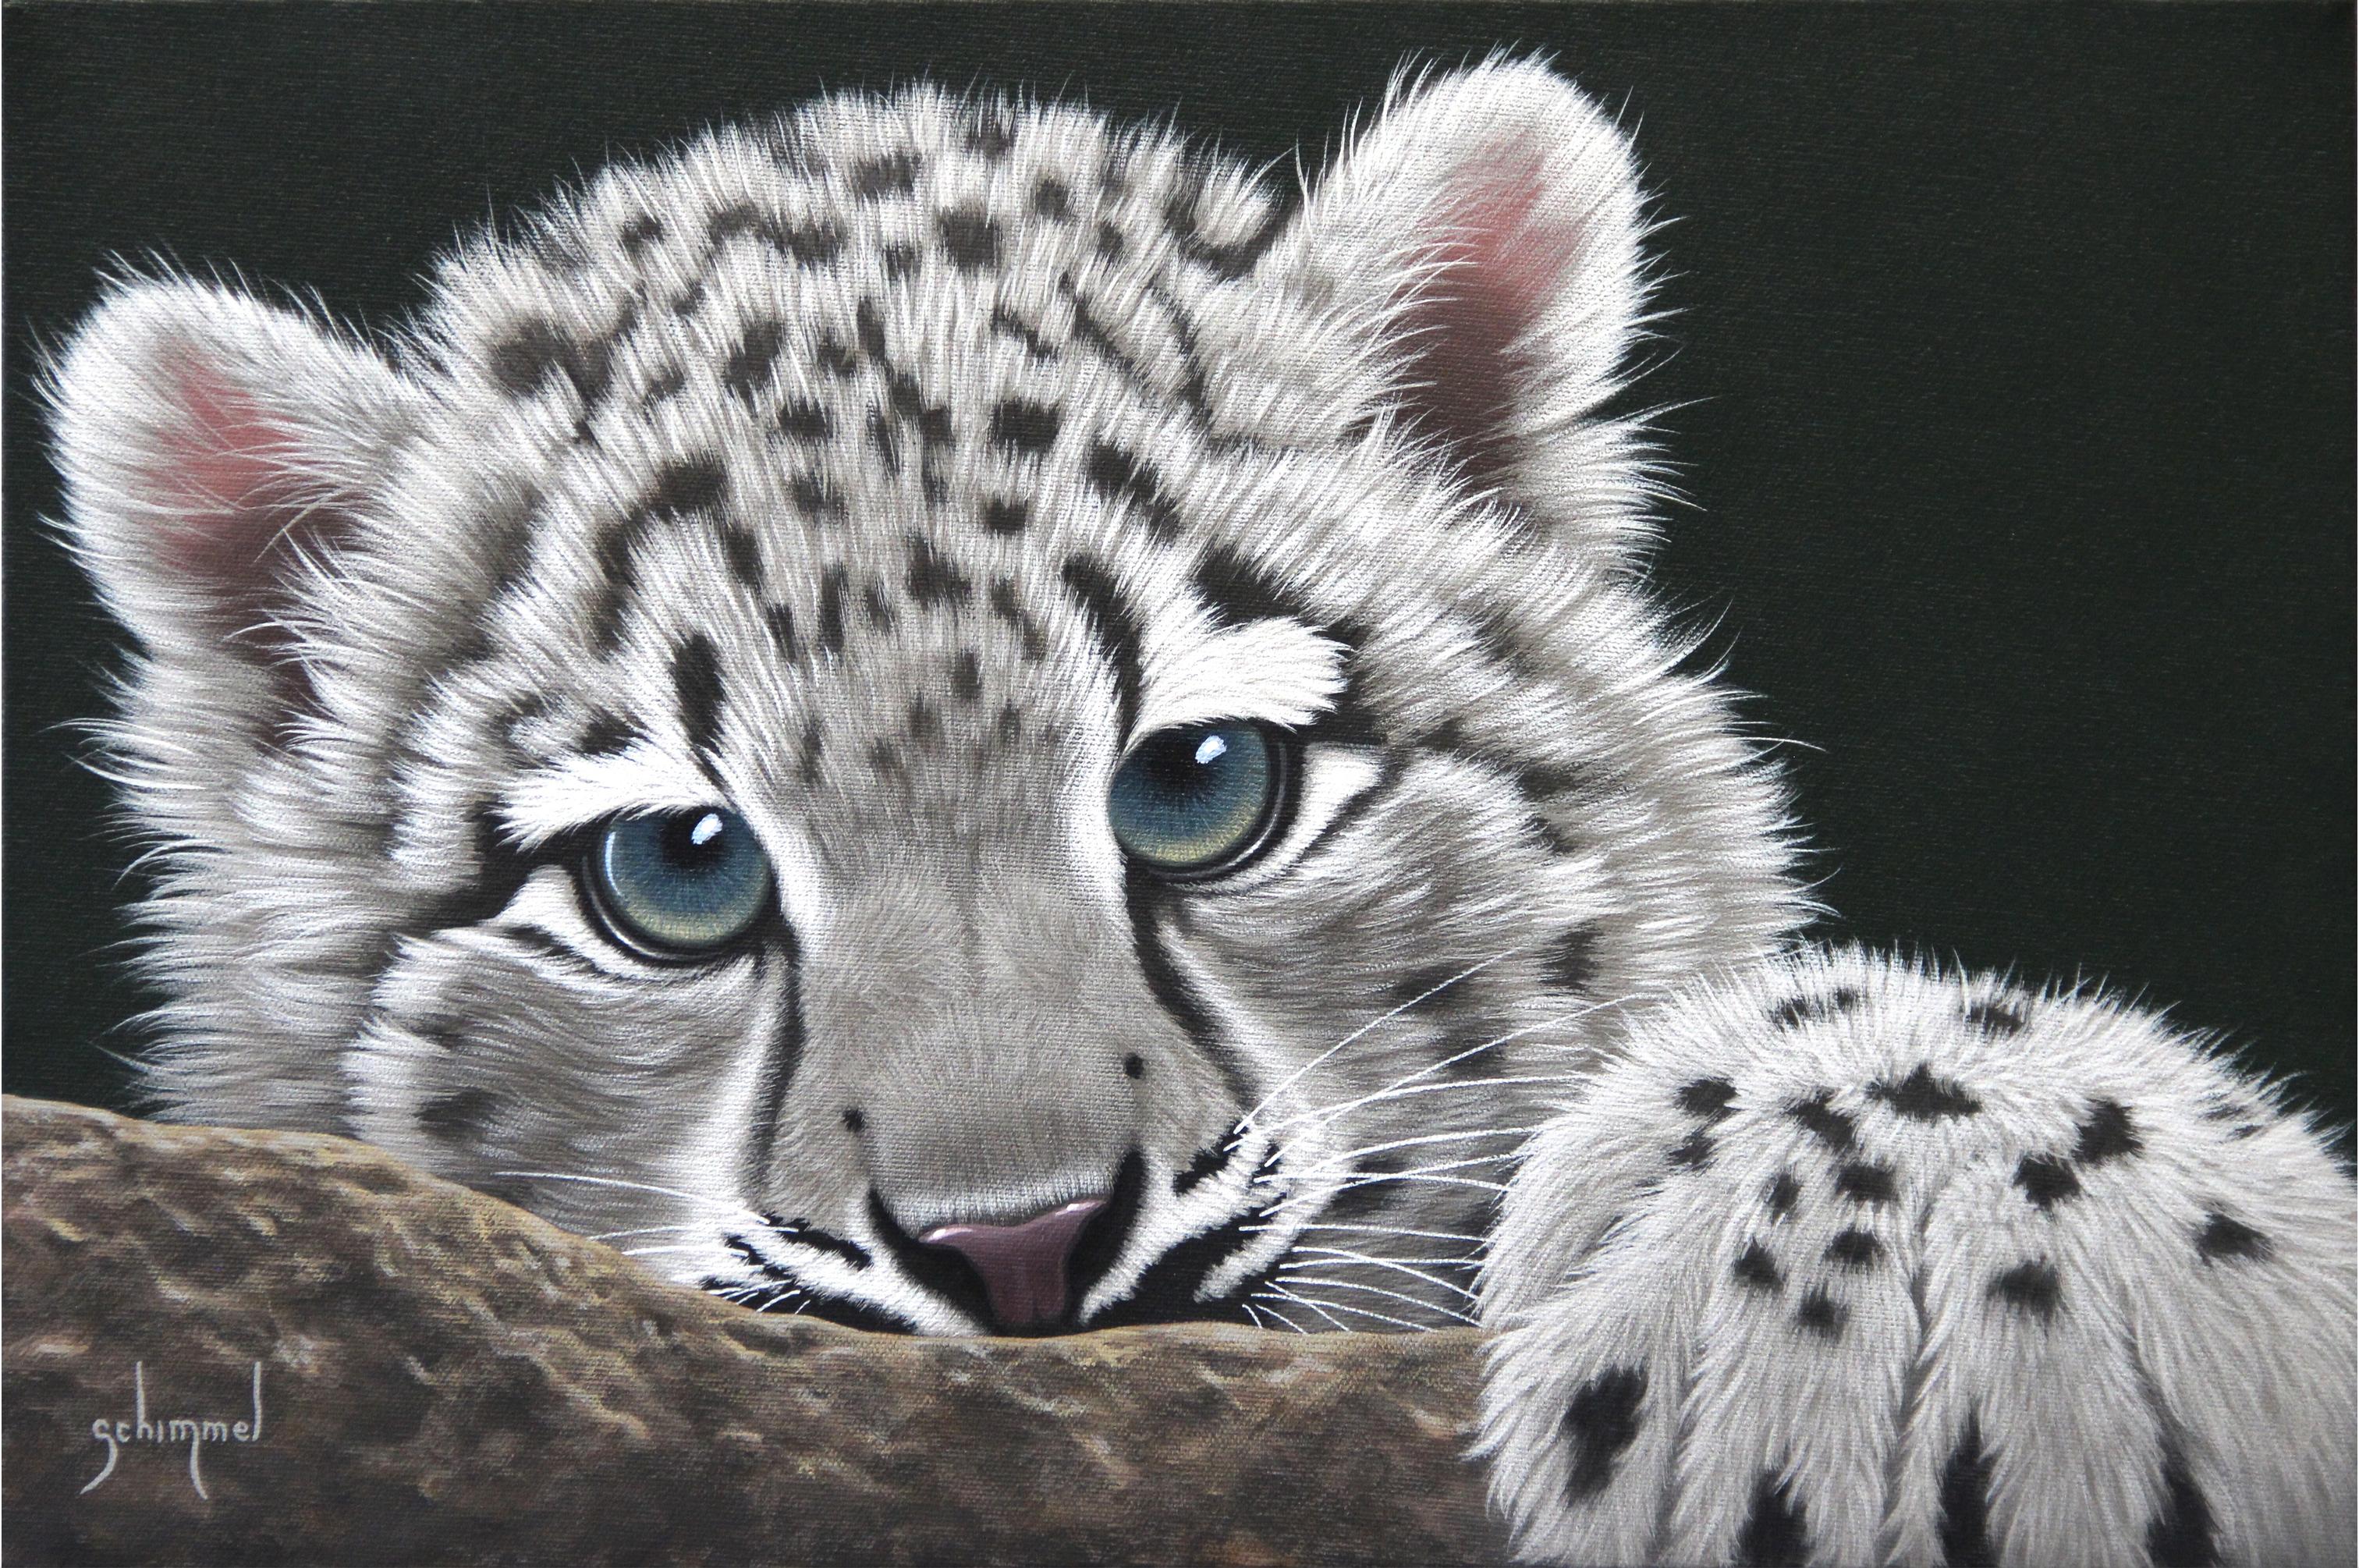 Young Snow Leopard By Schim Schimmel Cute Baby Animals Snow Leopard Art Cat Artwork